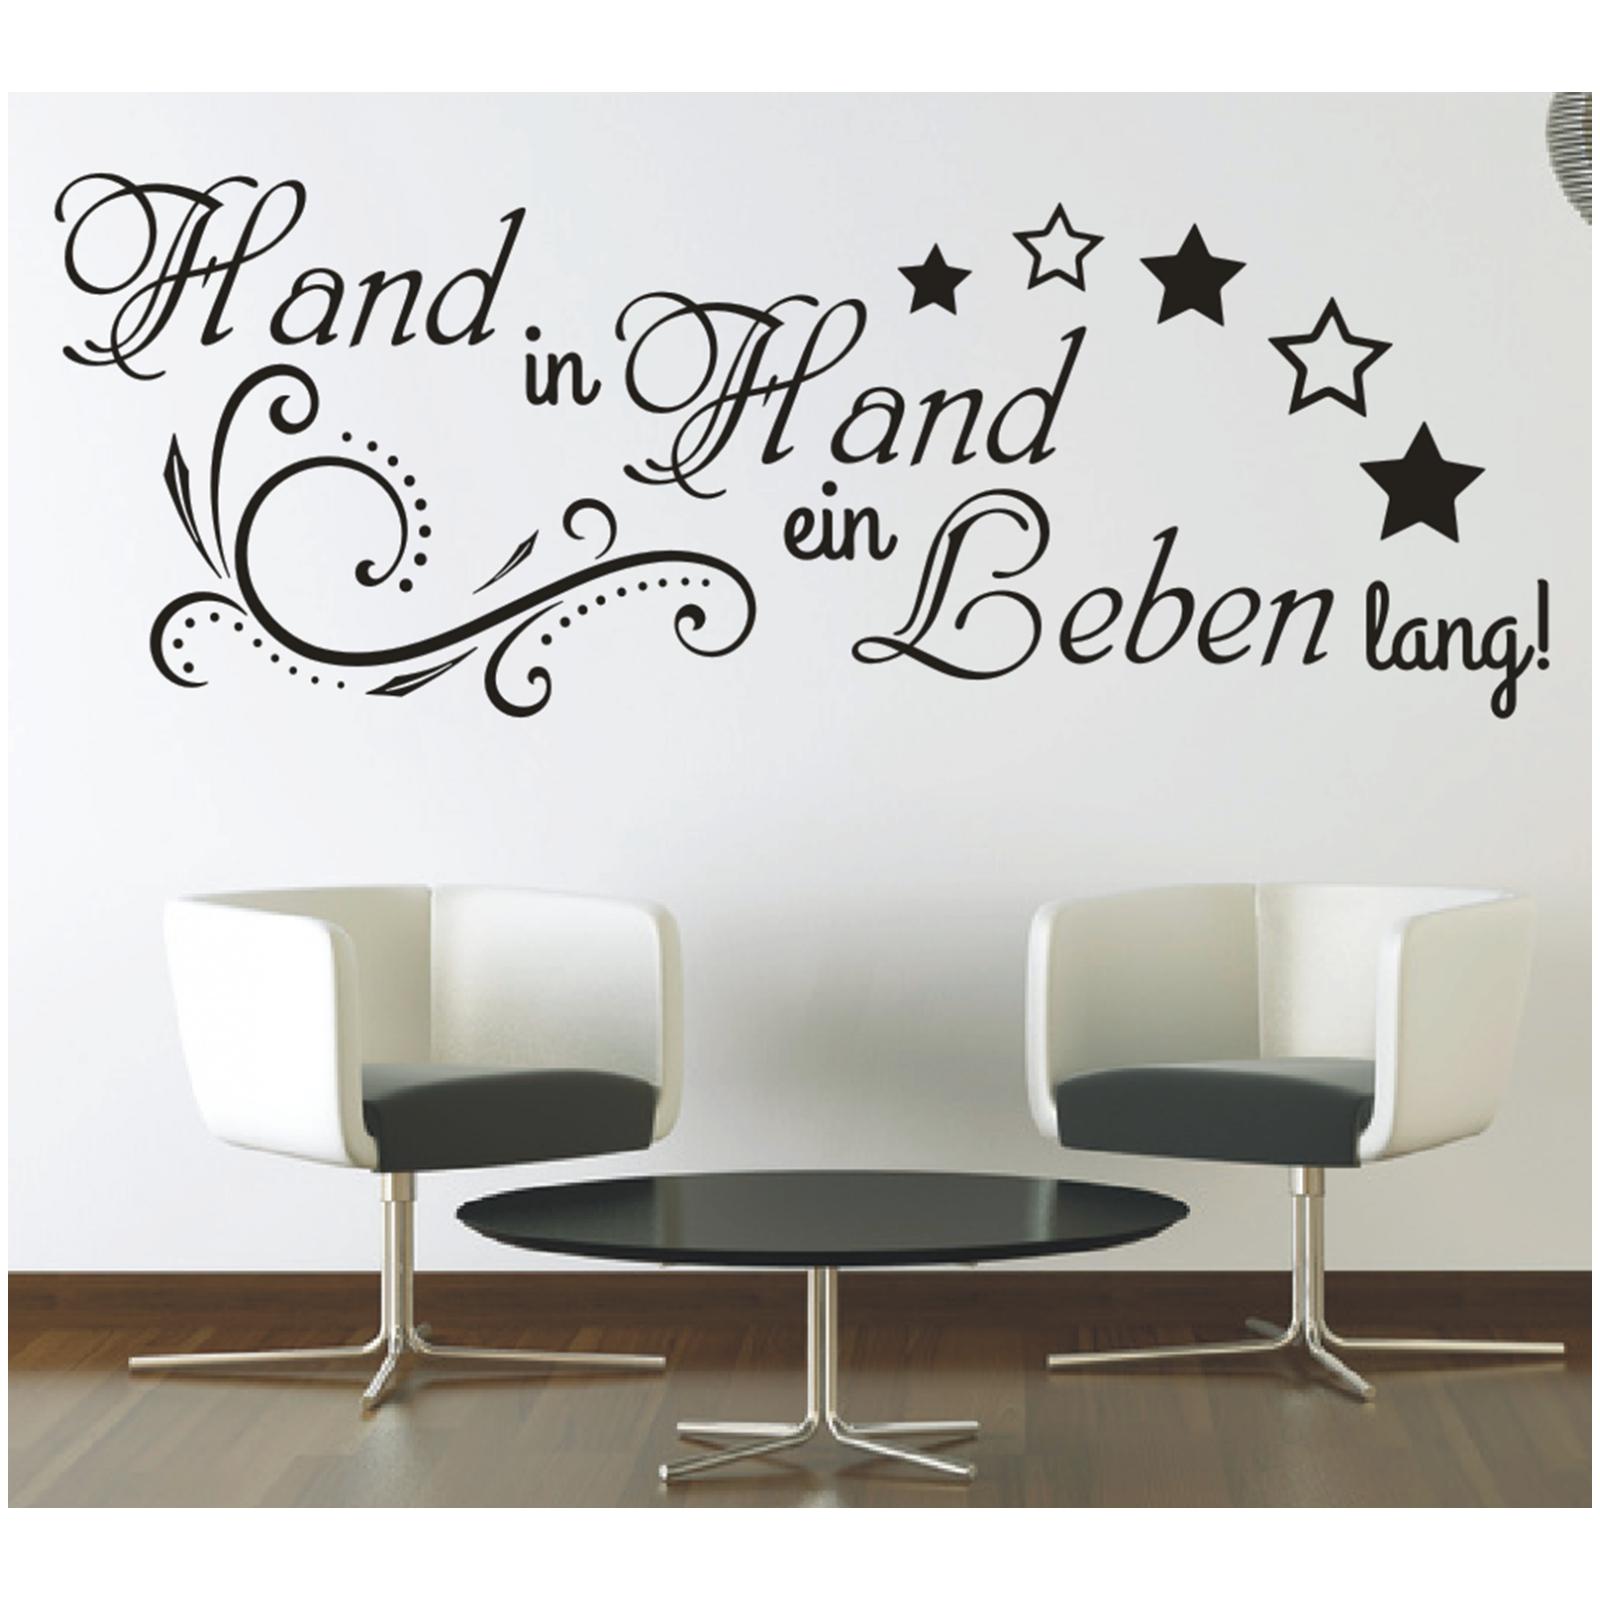 Wandtattoo-Spruch-Zusammen-Hand-Leben-lang-Wandsticker-Sticker-Wandaufkleber-3